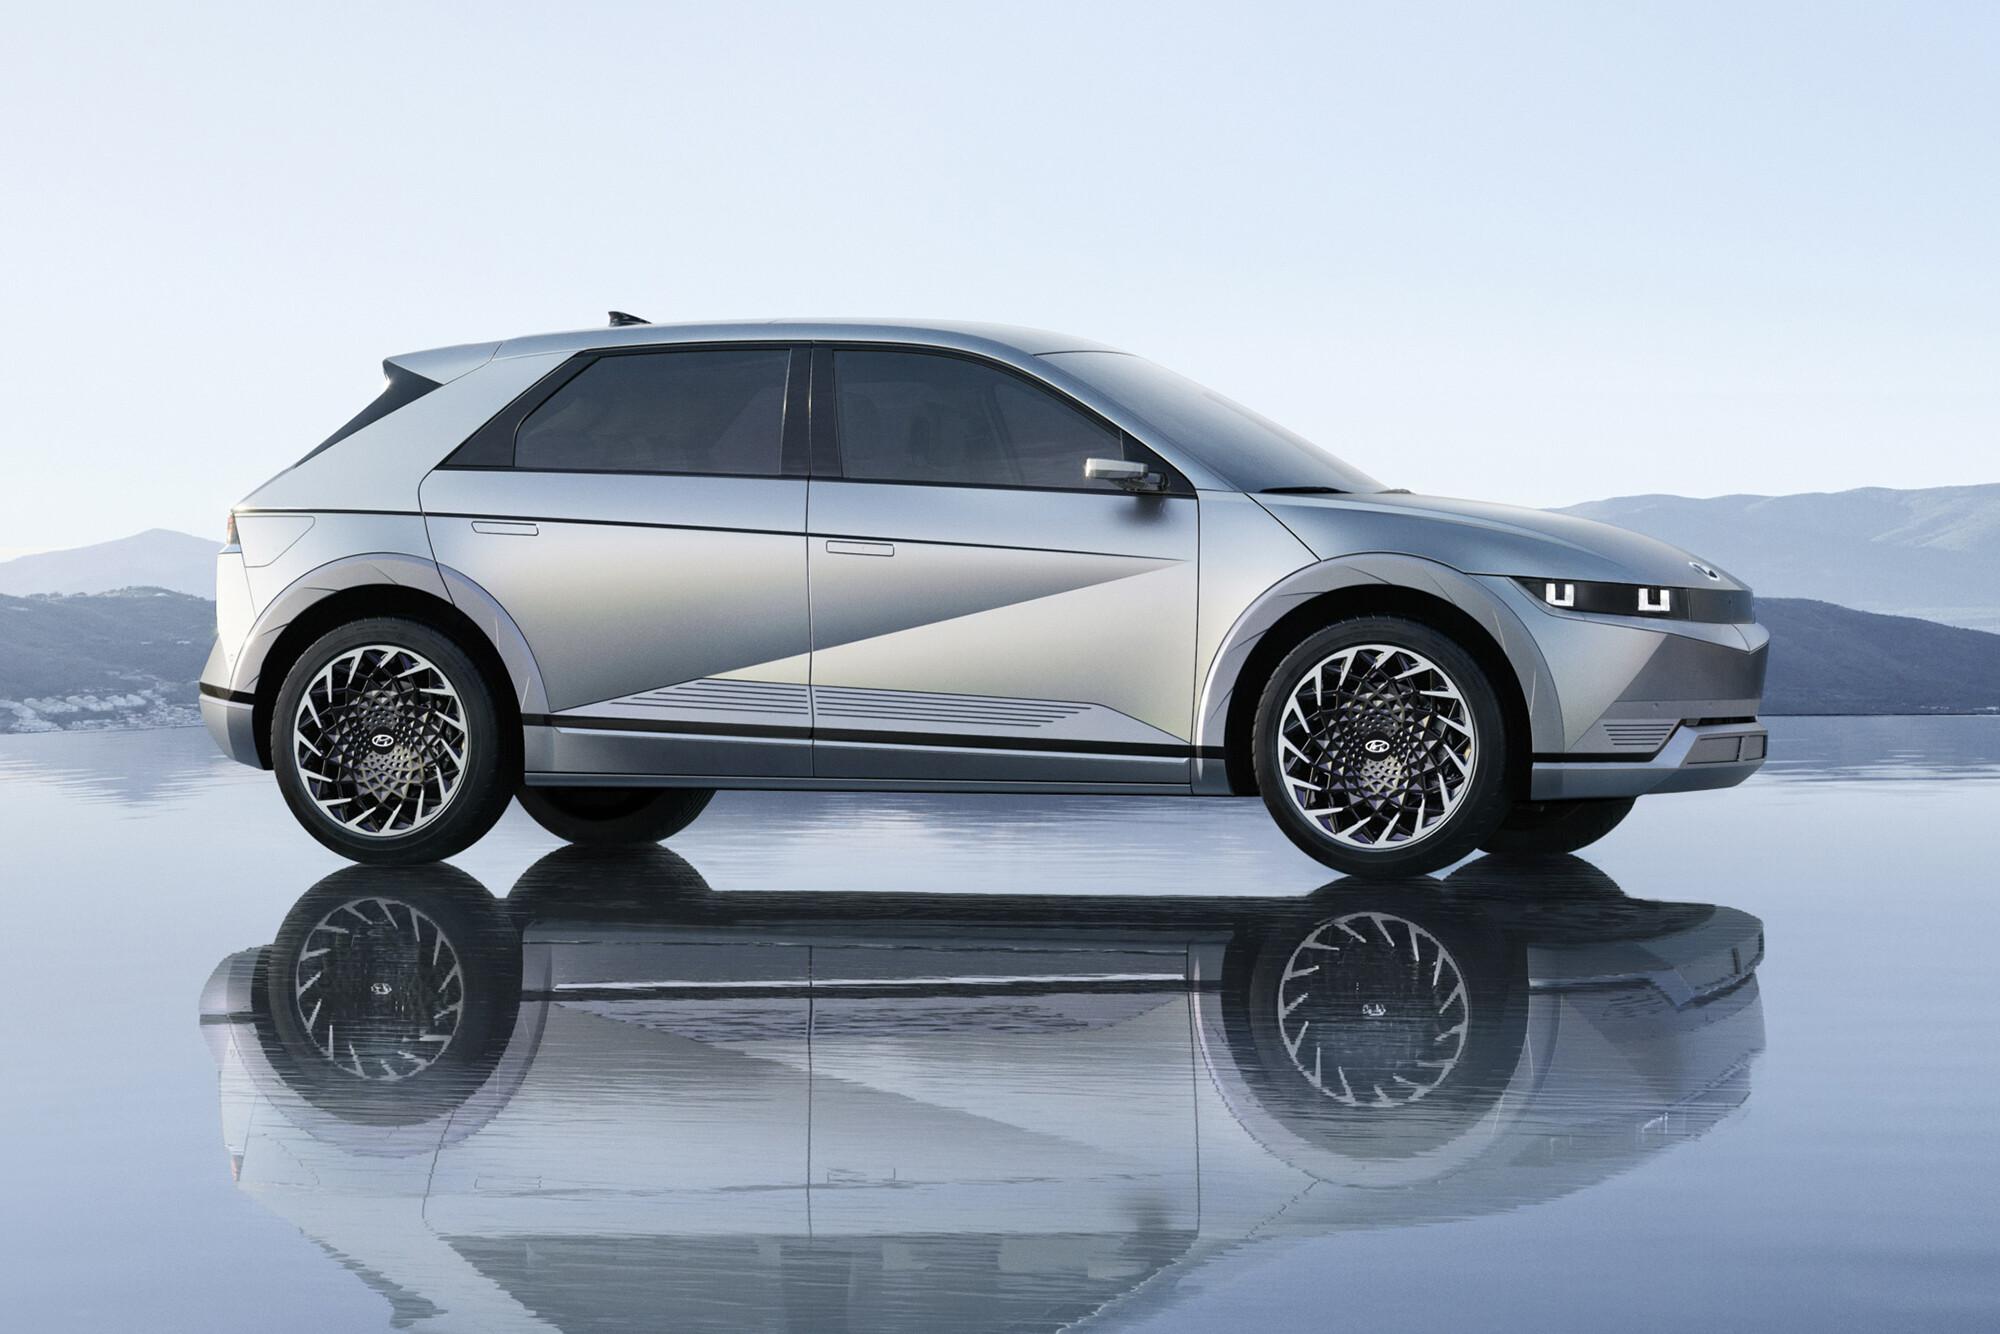 Archive Whichcar 2021 02 23 1 2022 Hyundai Ioniq 5 Electric Vehicle Revealed 7